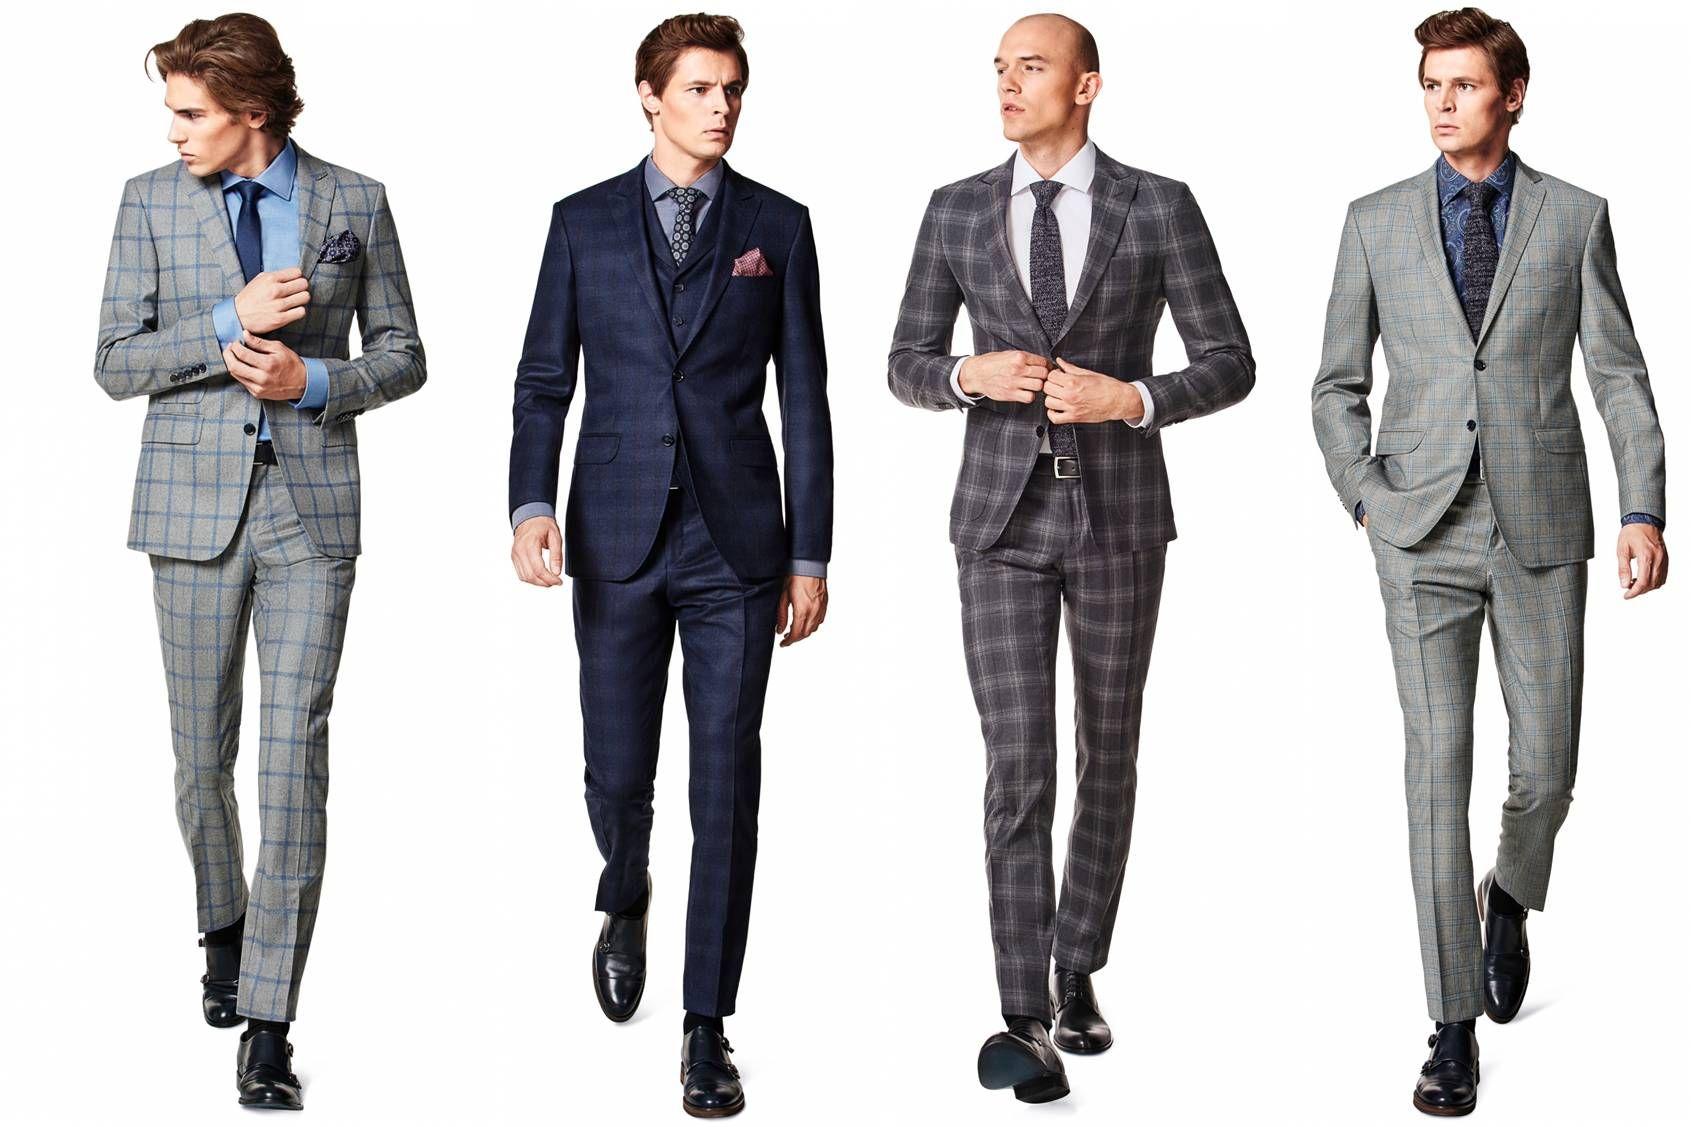 Garnitur W Krate Vistula 1 Jpg 1691 1127 Mens Fashion Pantsuit Fashion